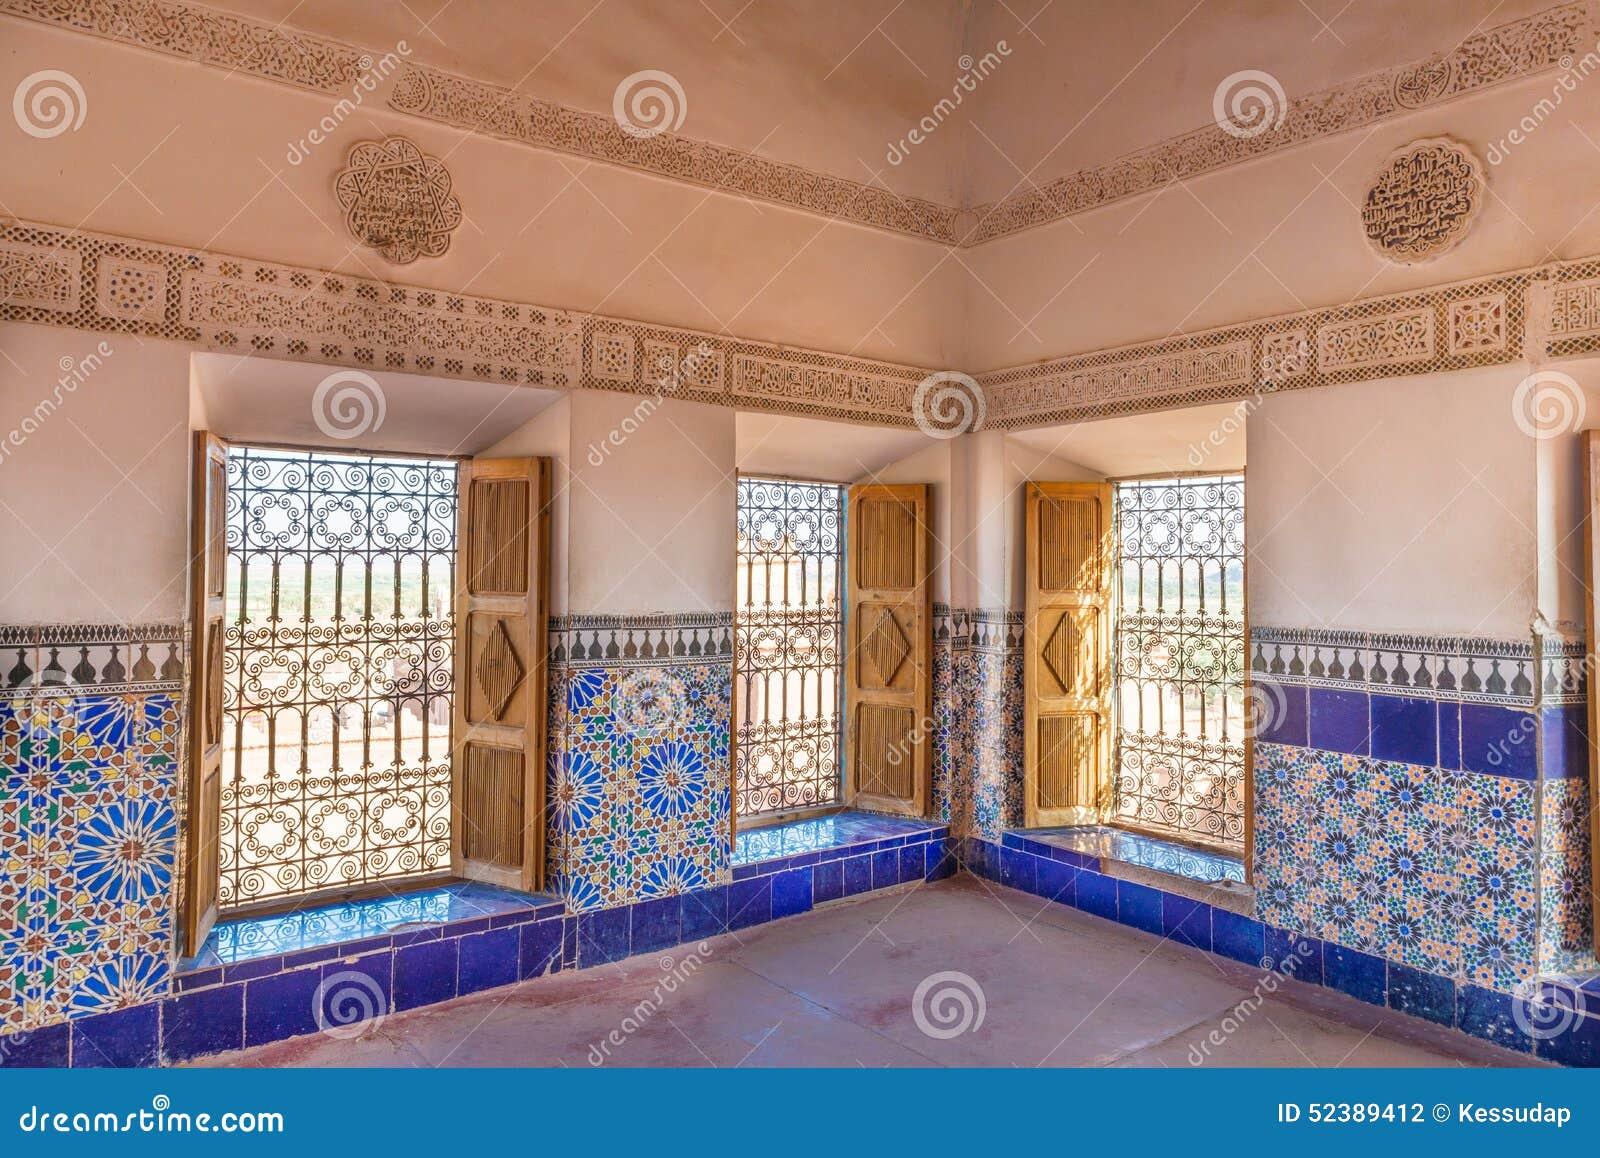 Le mattonelle variopinte di kasbah de taourirt come stile arabo